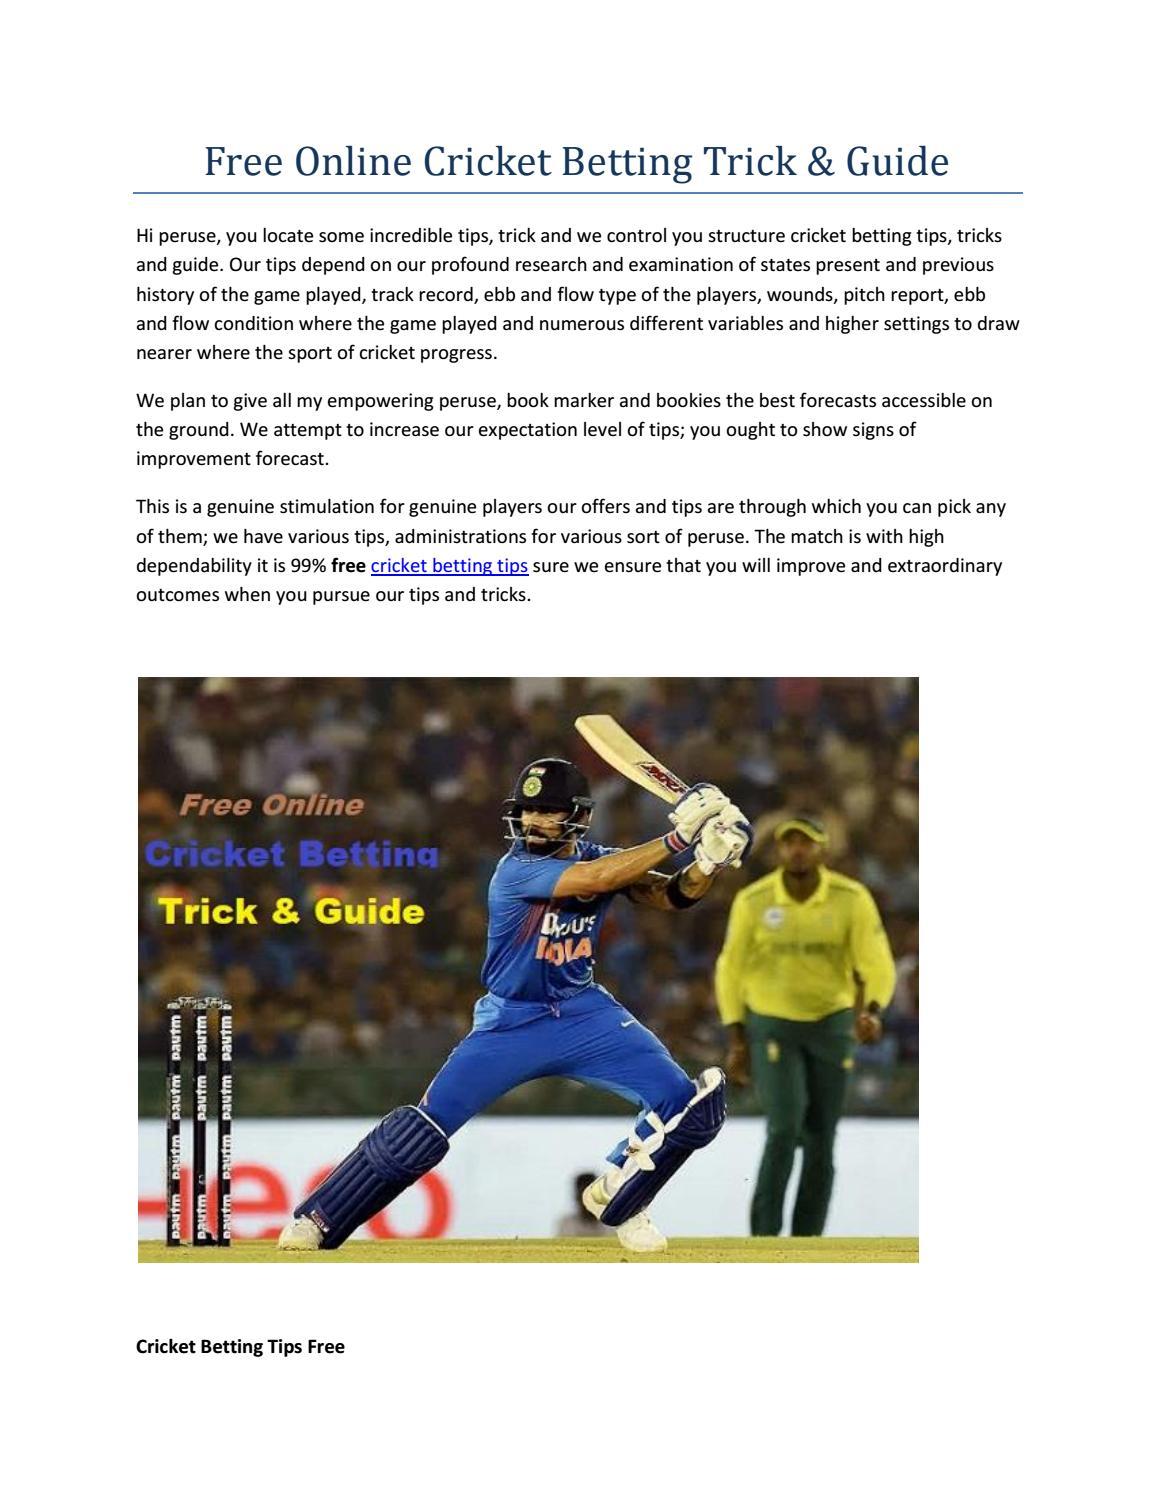 cricket betting online free